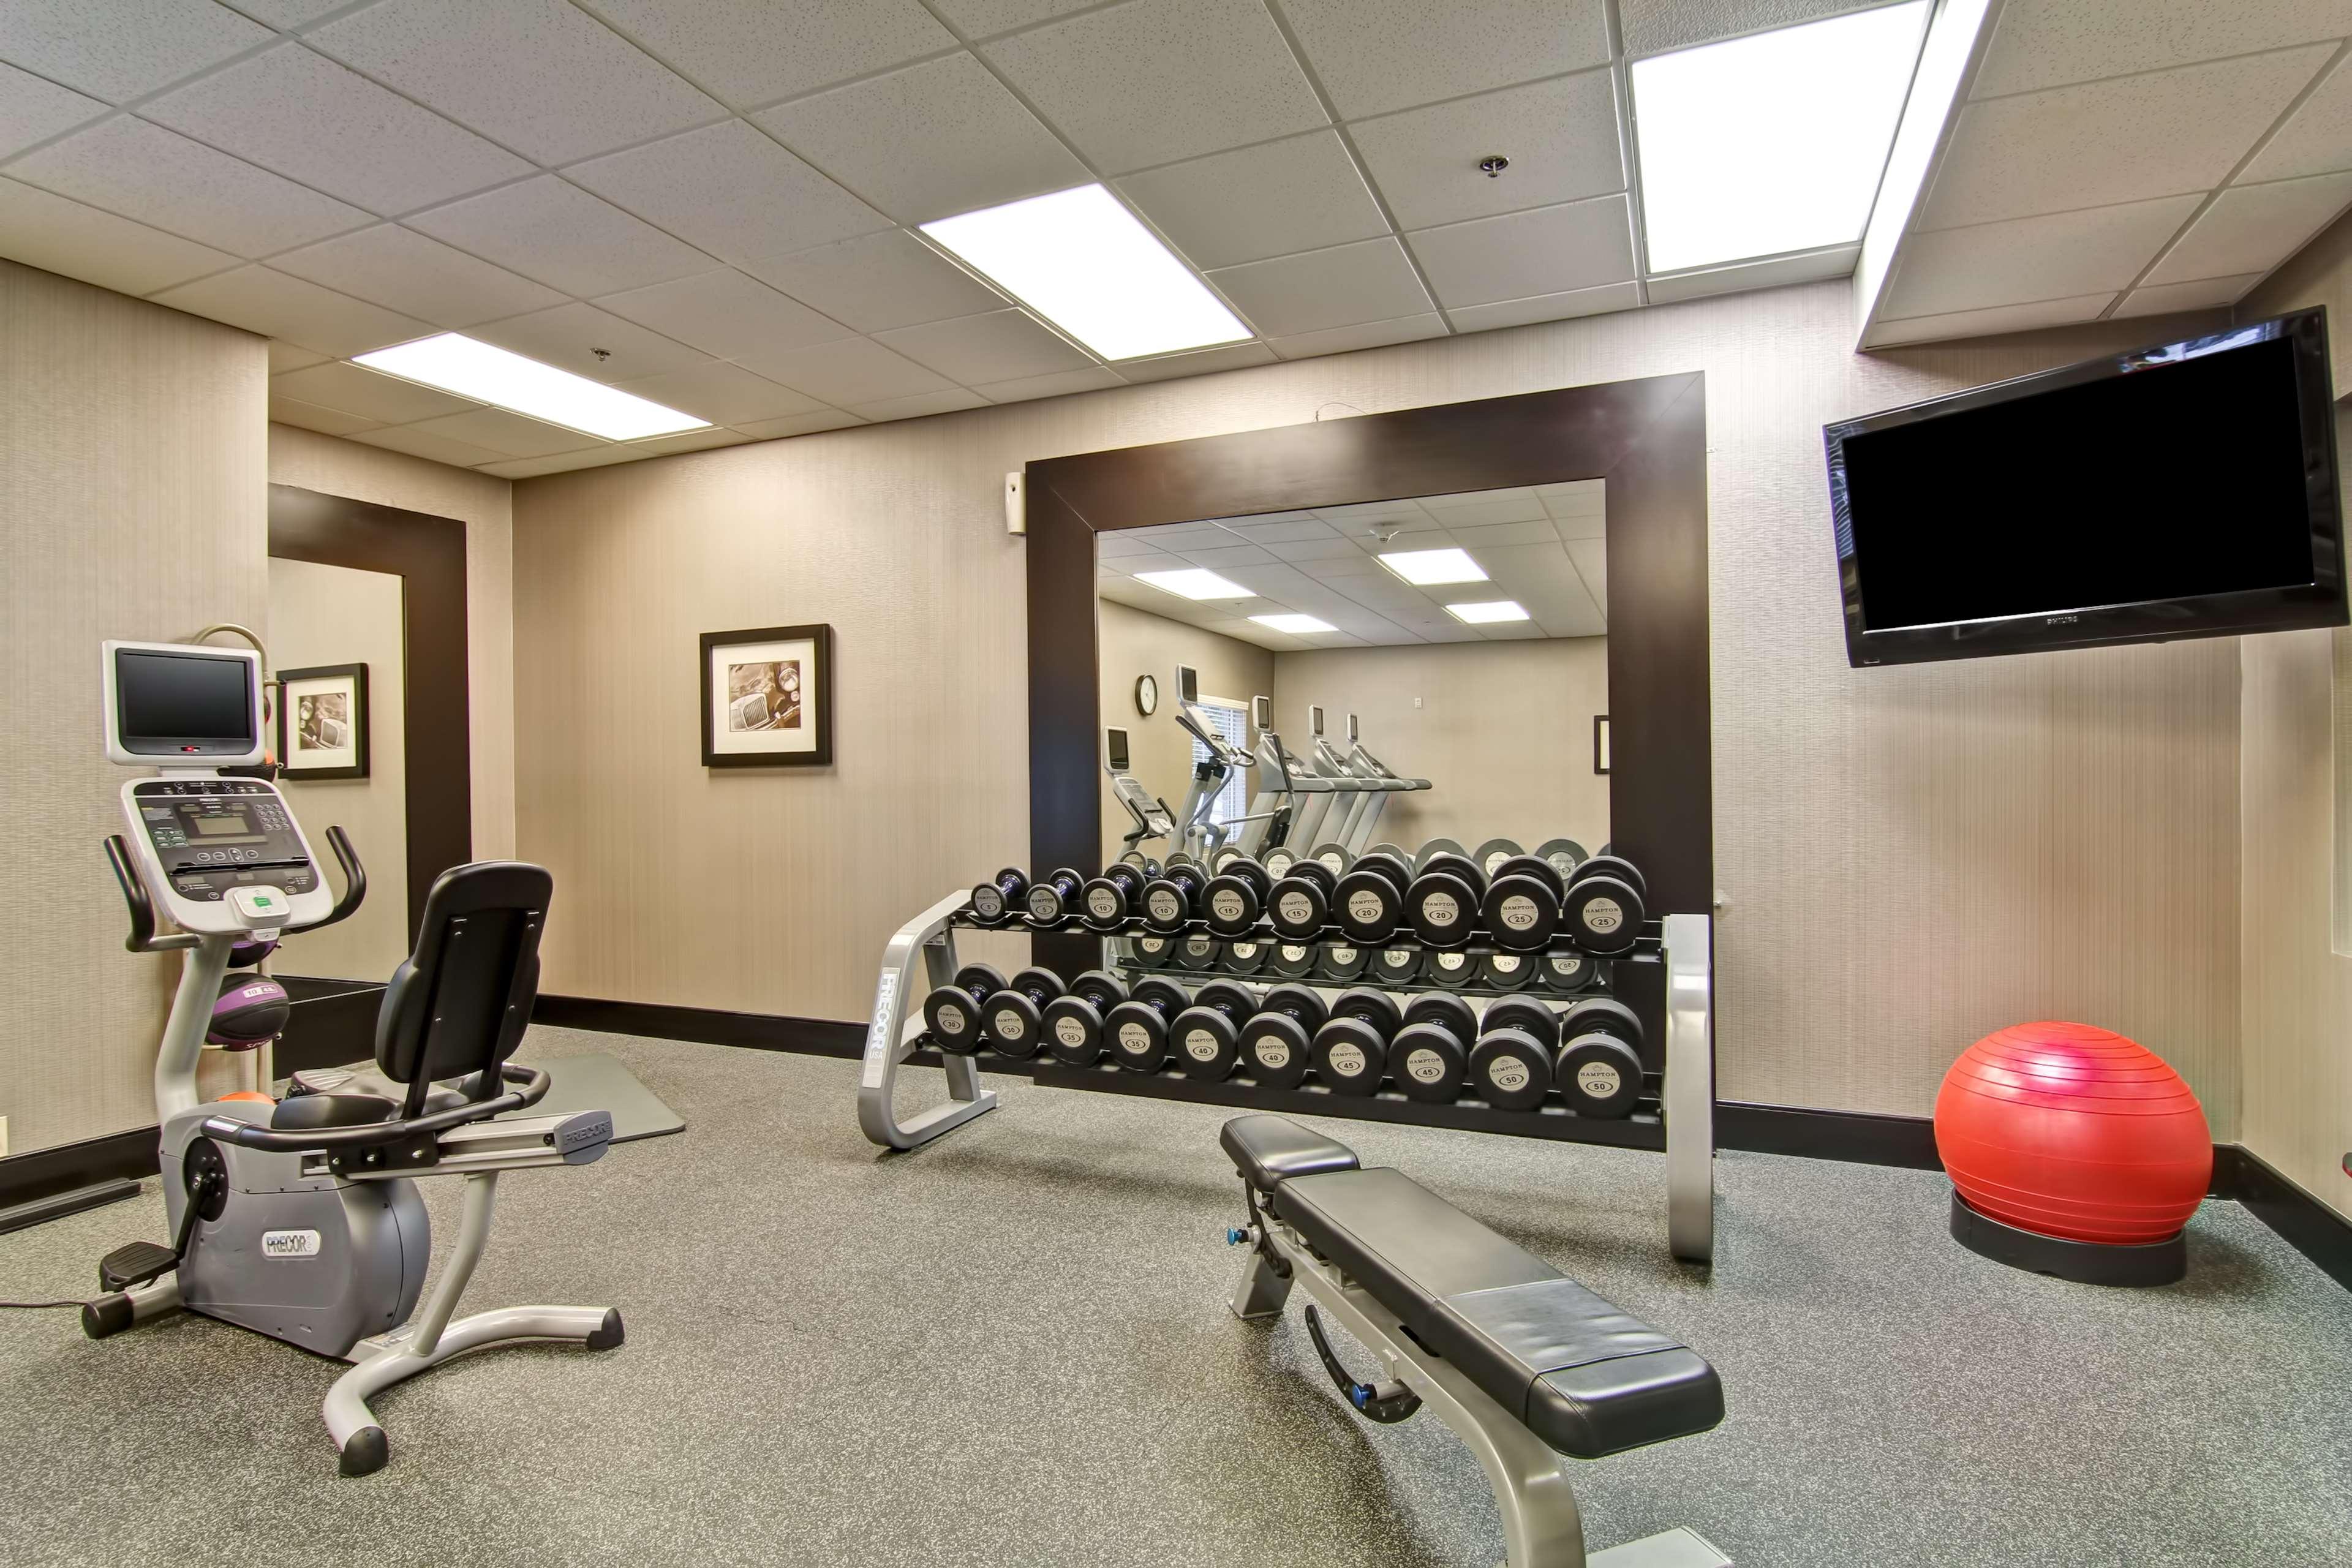 Homewood Suites by Hilton Cincinnati Airport South-Florence image 13